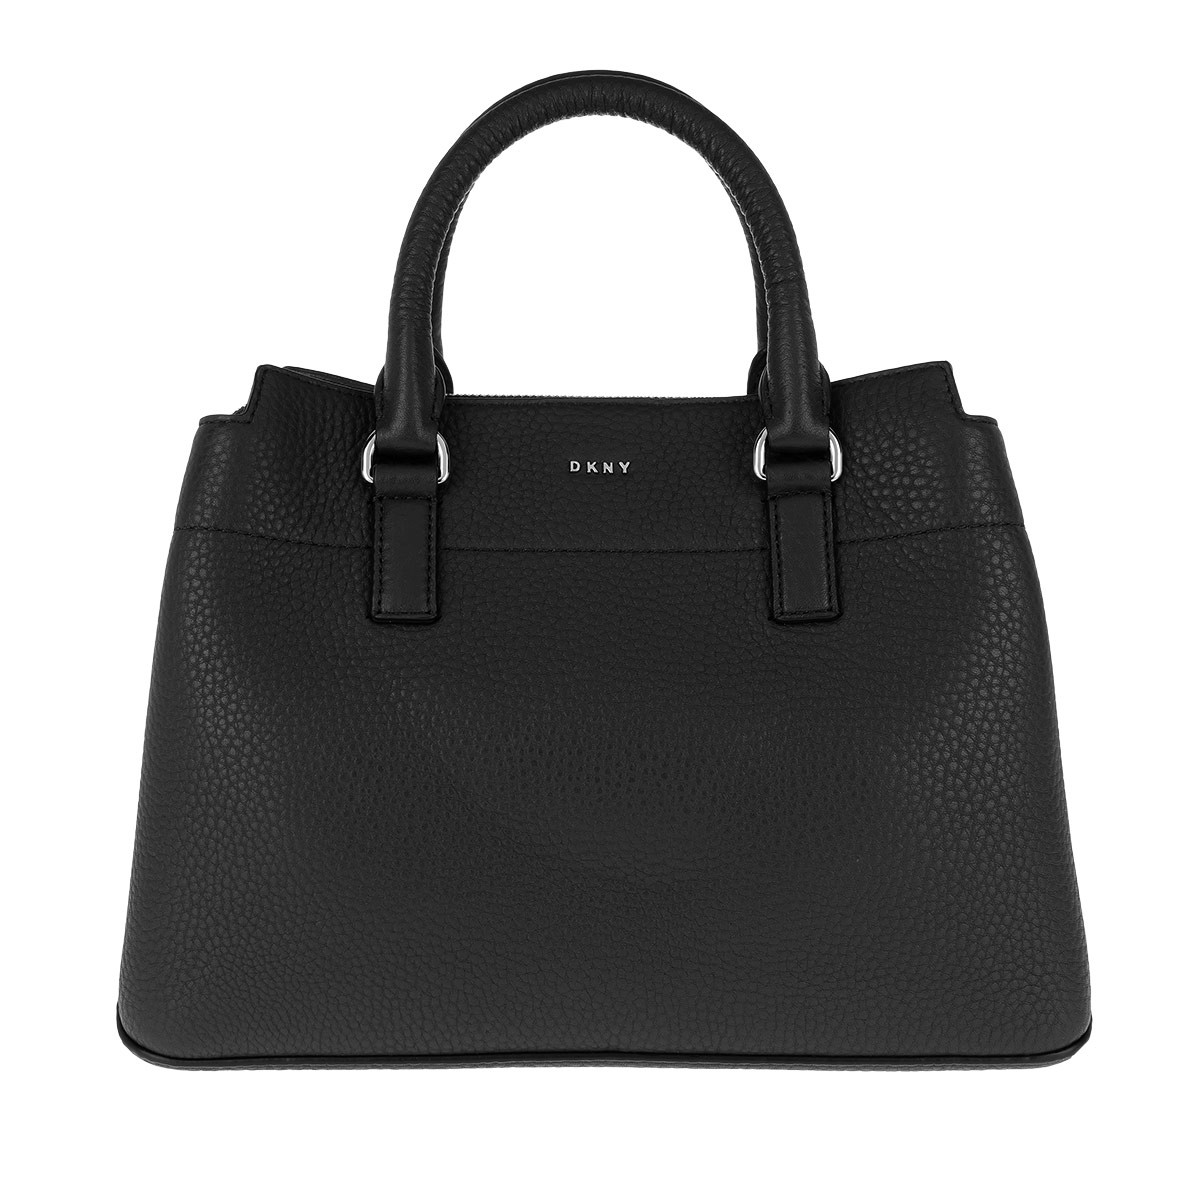 DKNY Satchel Bag - Bellah MD Satchel Bag Black/Silver - in schwarz - für Damen